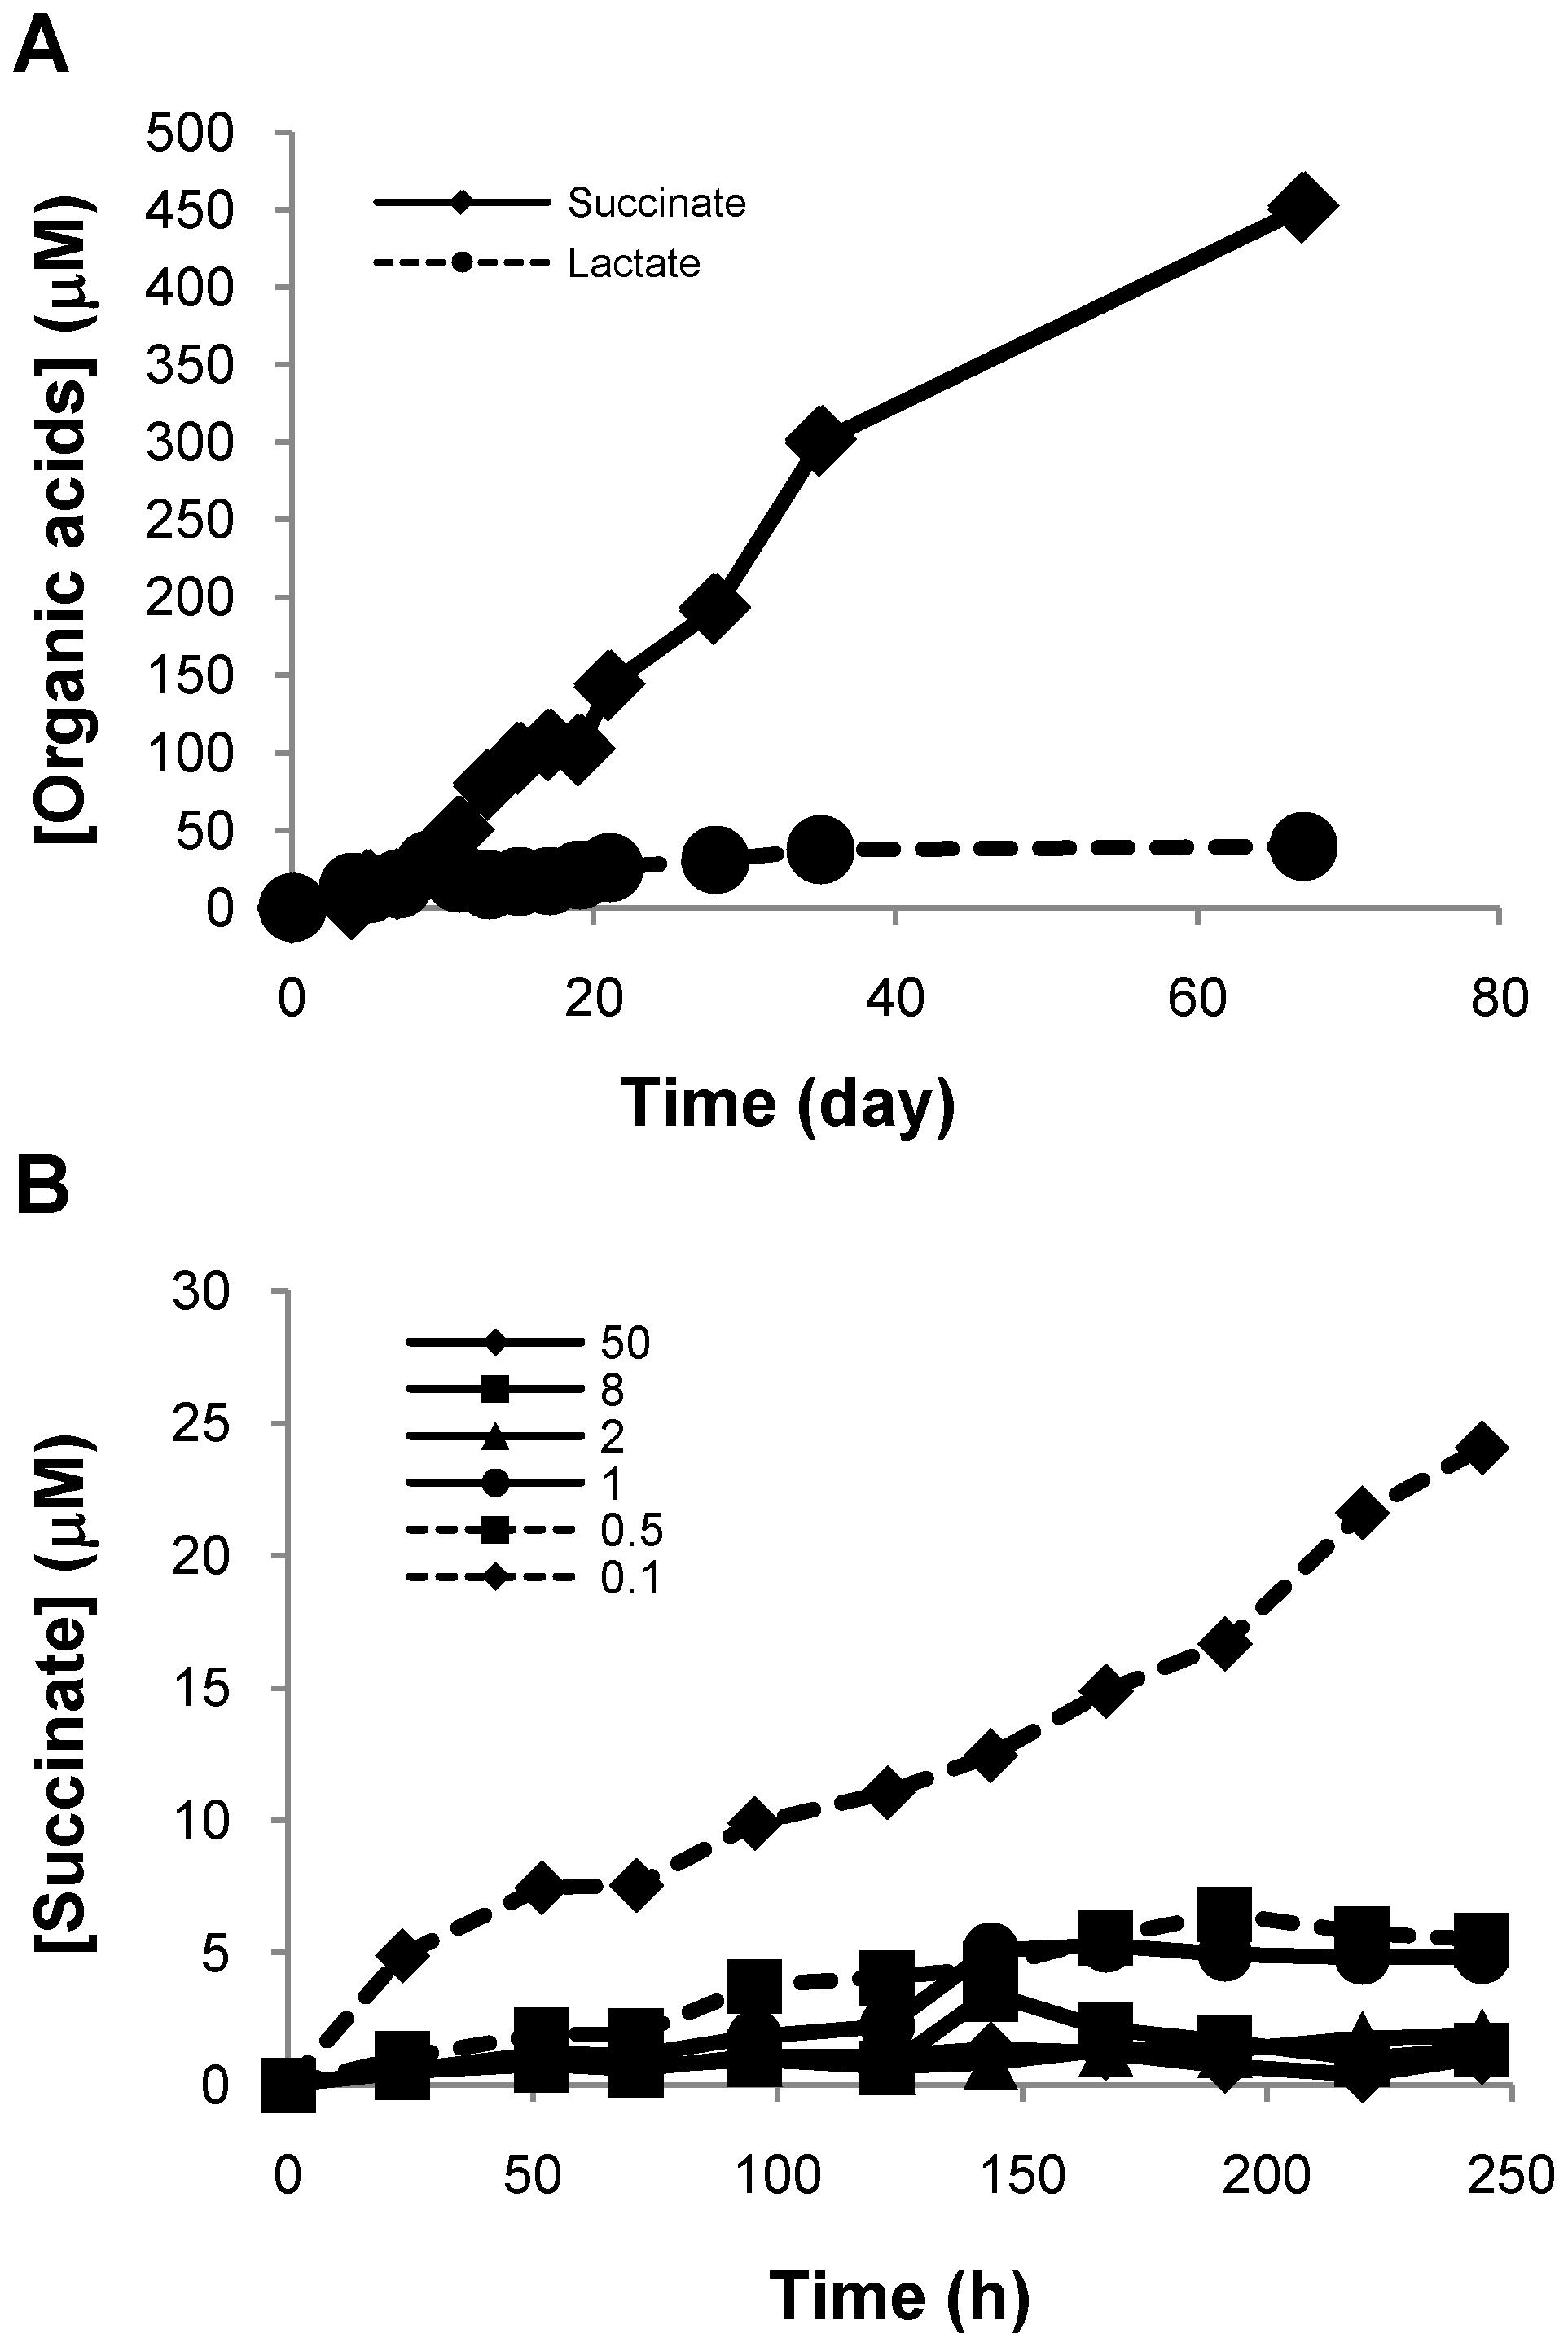 Succinate accumulates in supernatants of H<sub>37</sub>Rv culture under anaerobic condition.